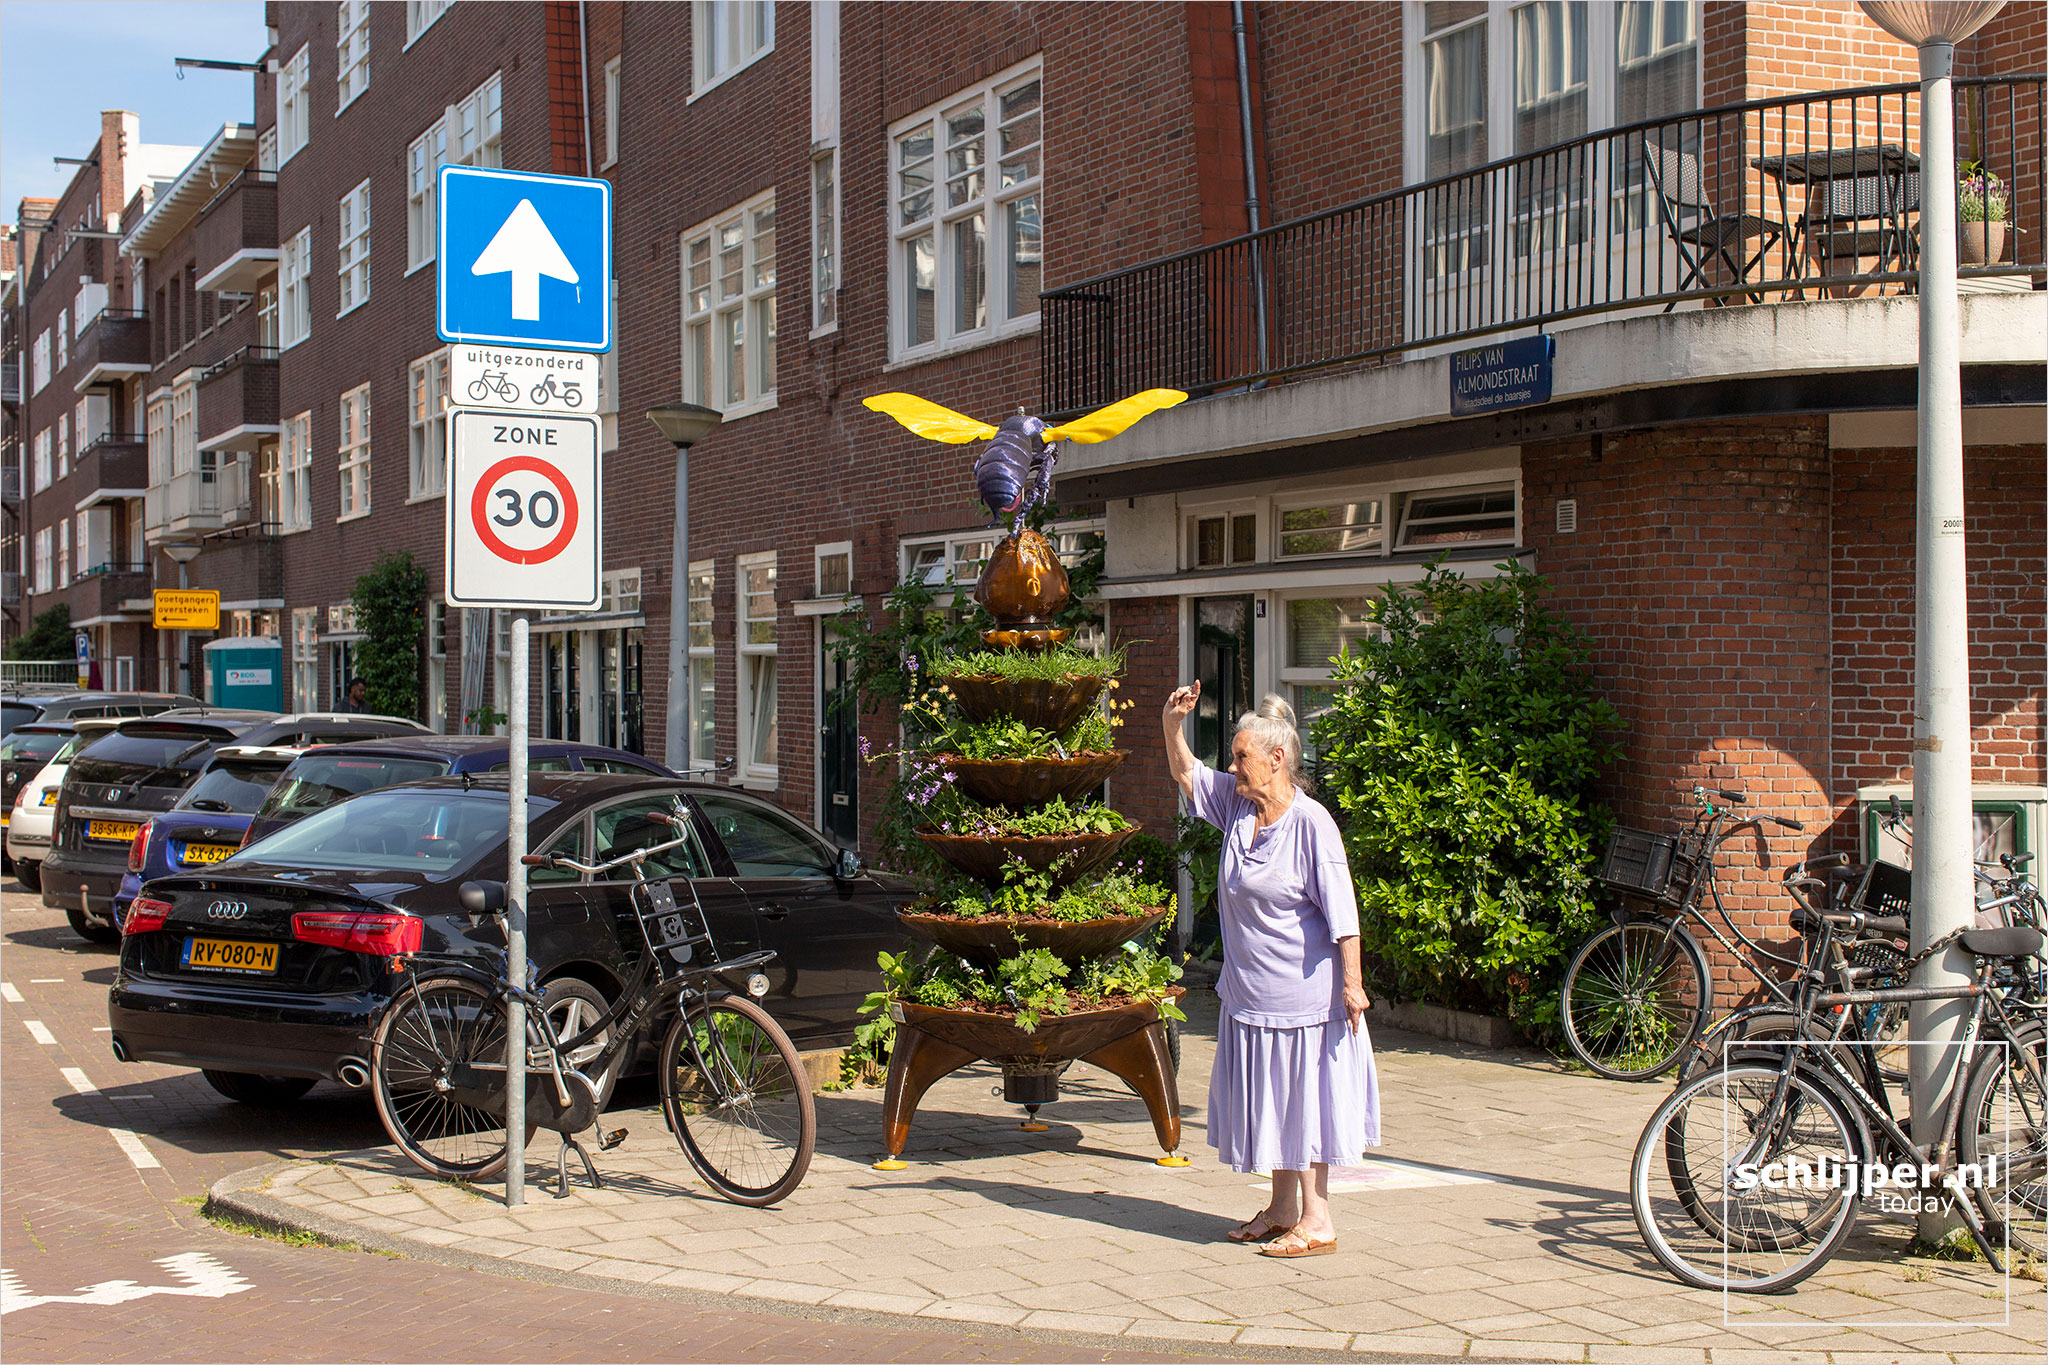 The Netherlands, Amsterdam 8 juni 2021